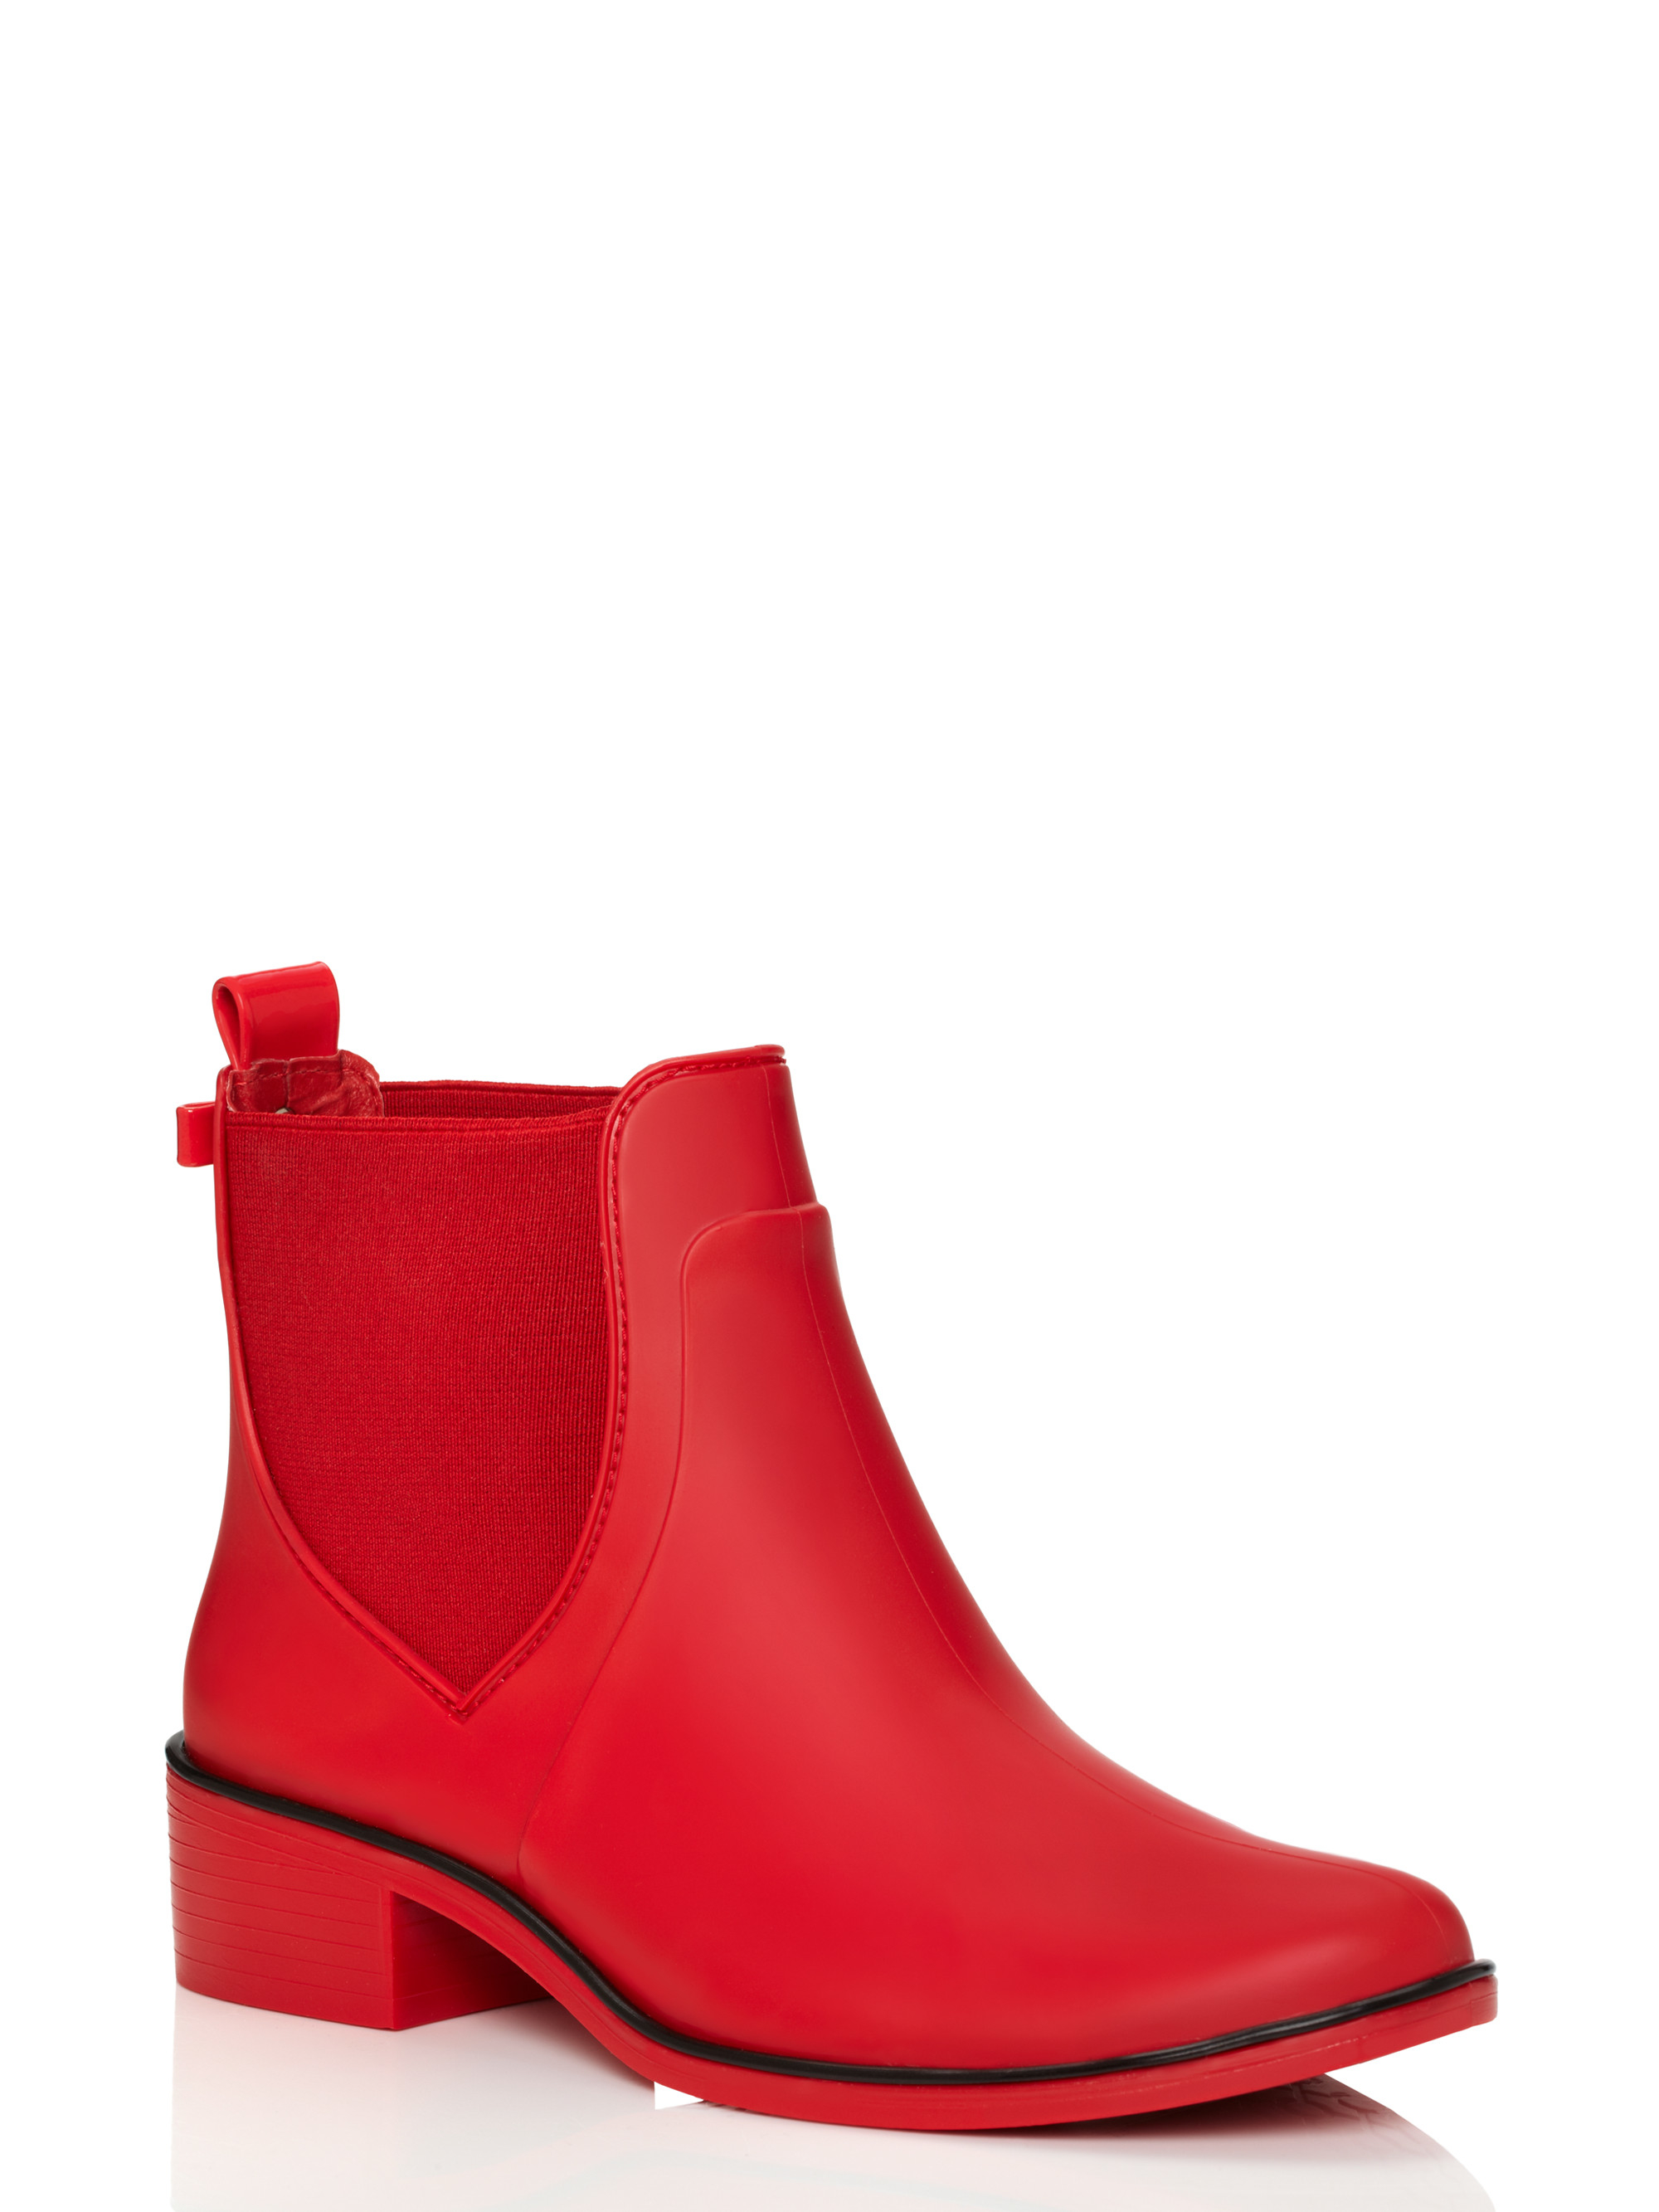 Lyst - Kate Spade Sedgewick Rain Boots In Red-5720